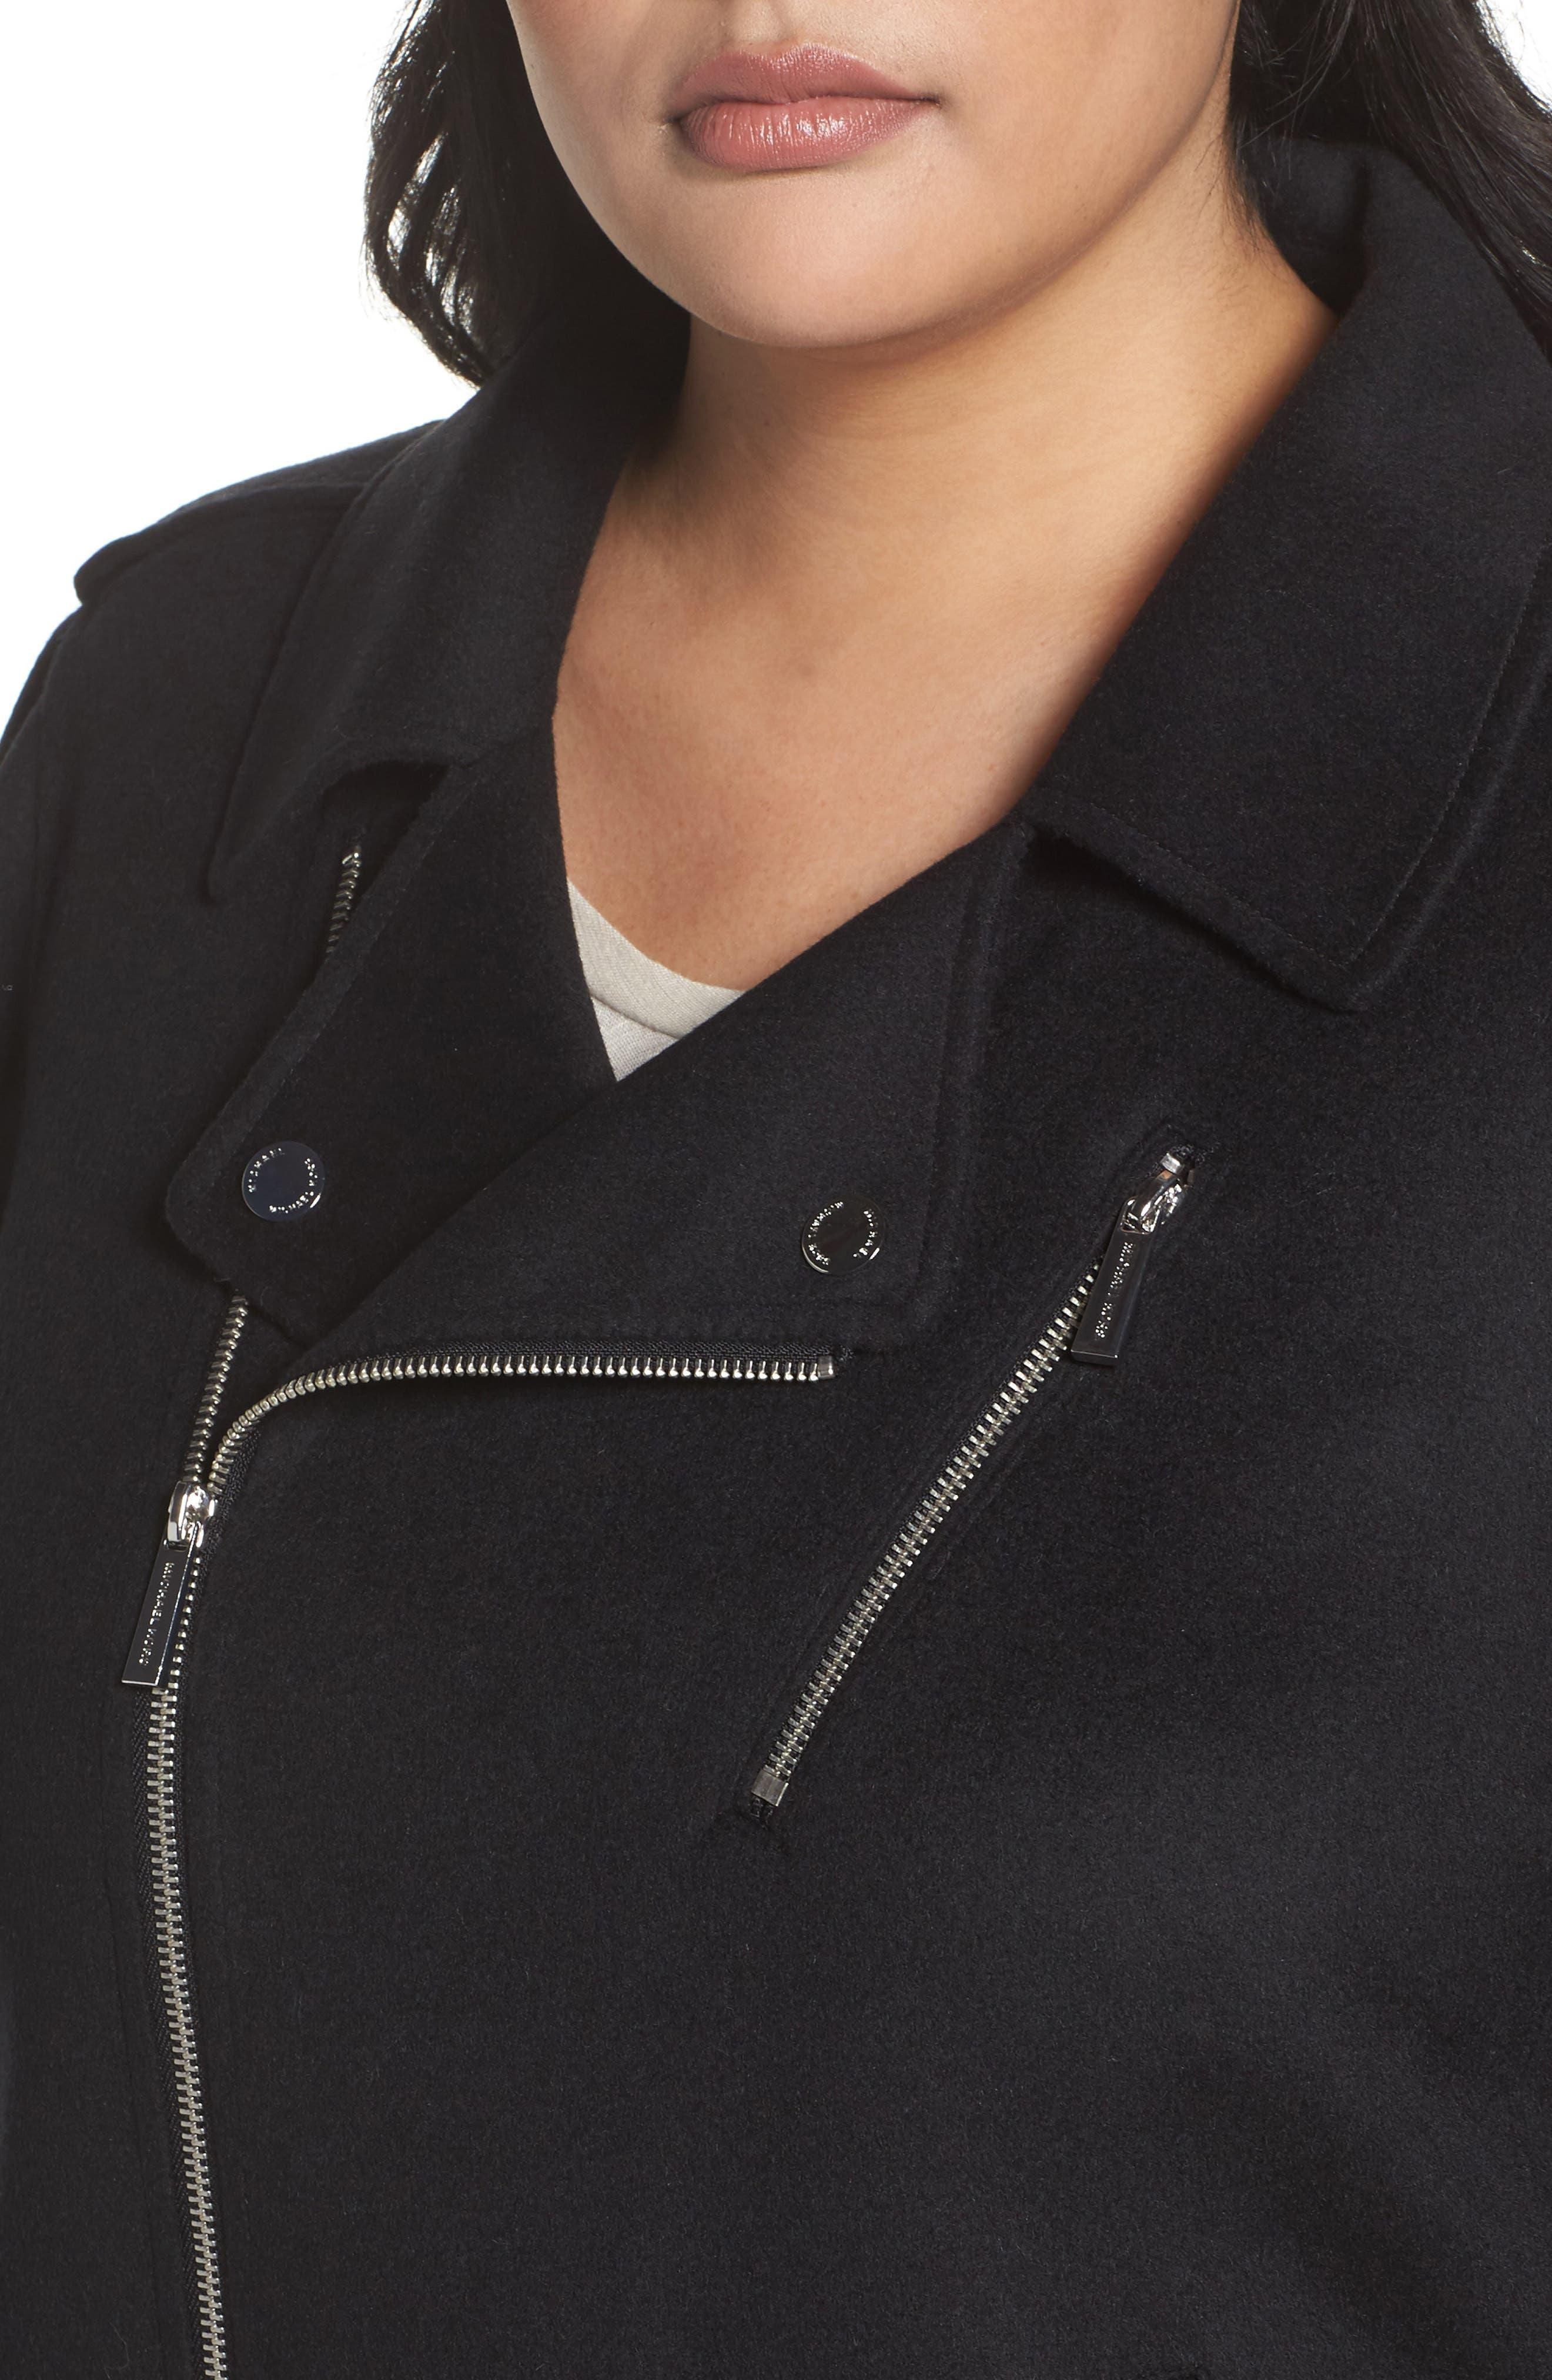 Wool Blend Moto Jacket,                             Alternate thumbnail 4, color,                             001